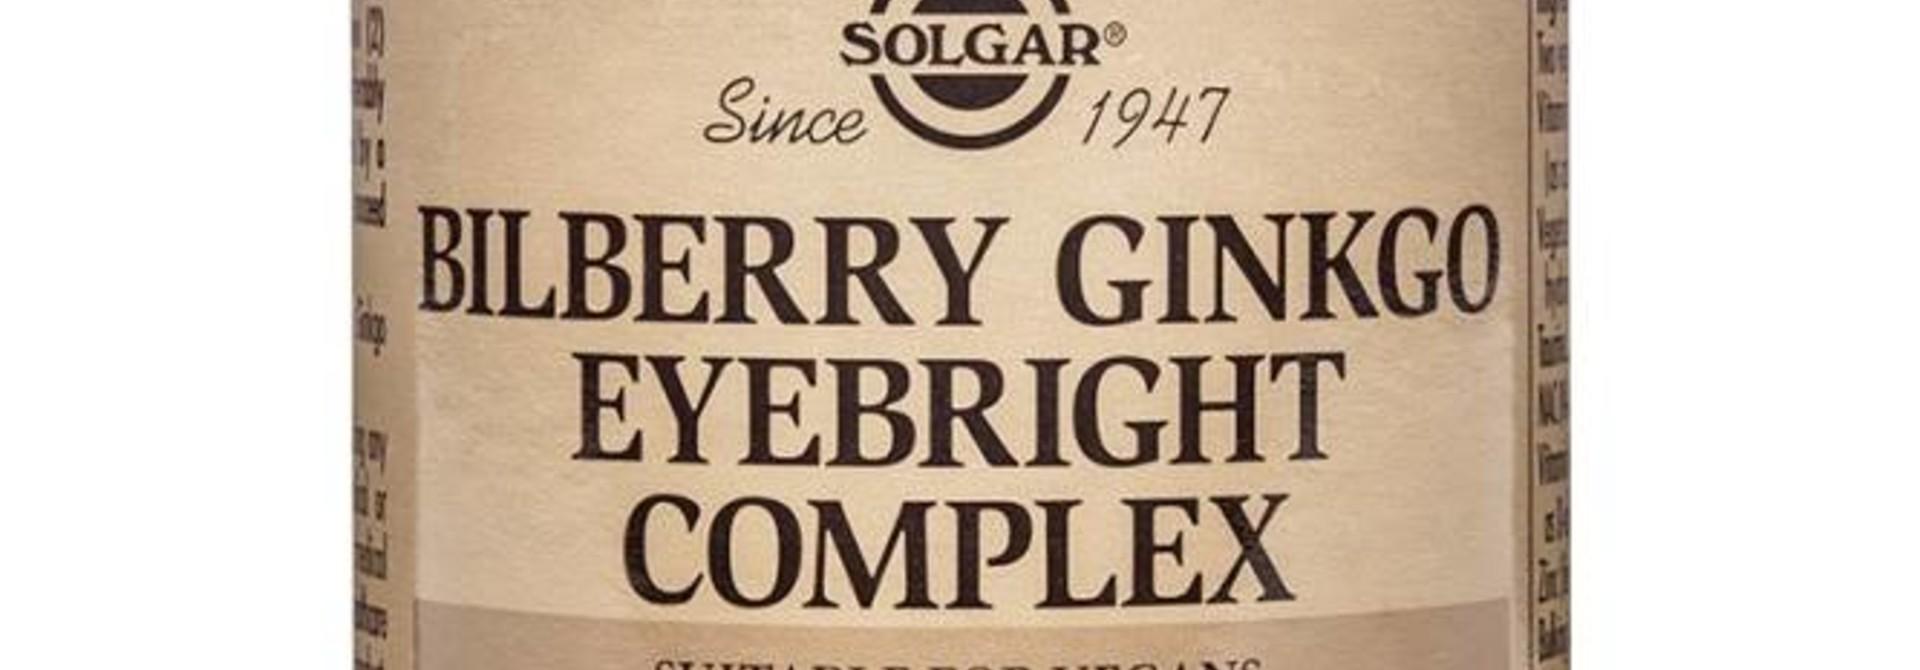 Bilberry Ginkgo Eyebright Complex 60 plantaardige capsules